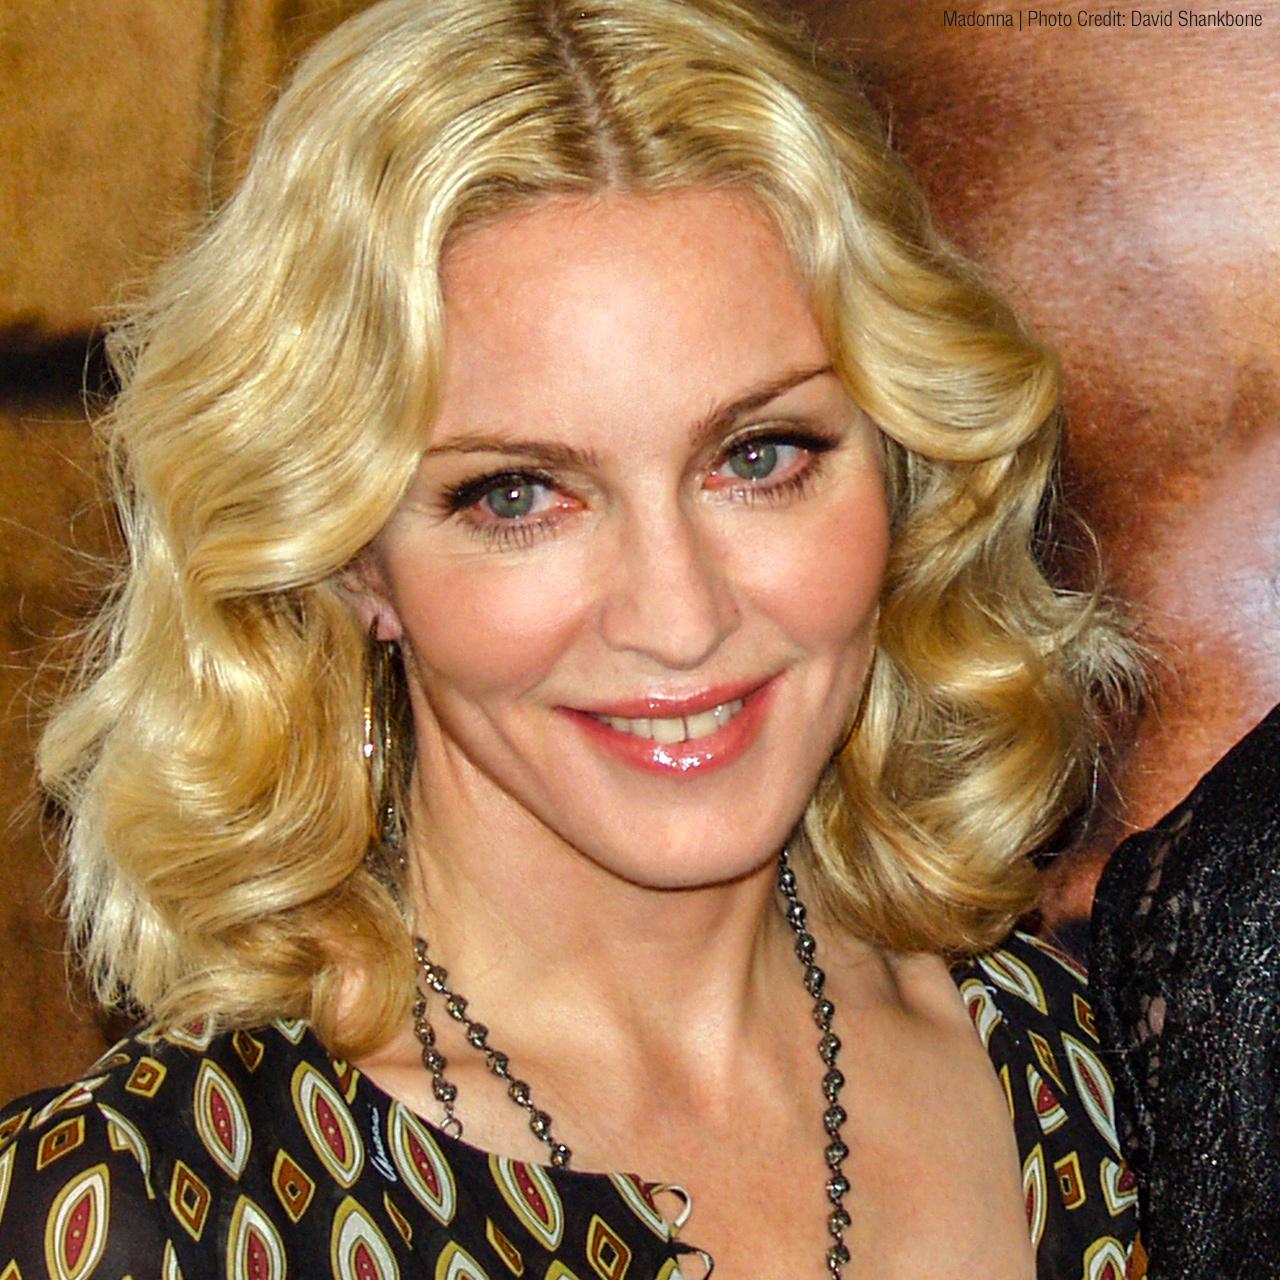 Madonna | Photo By David Shankbone